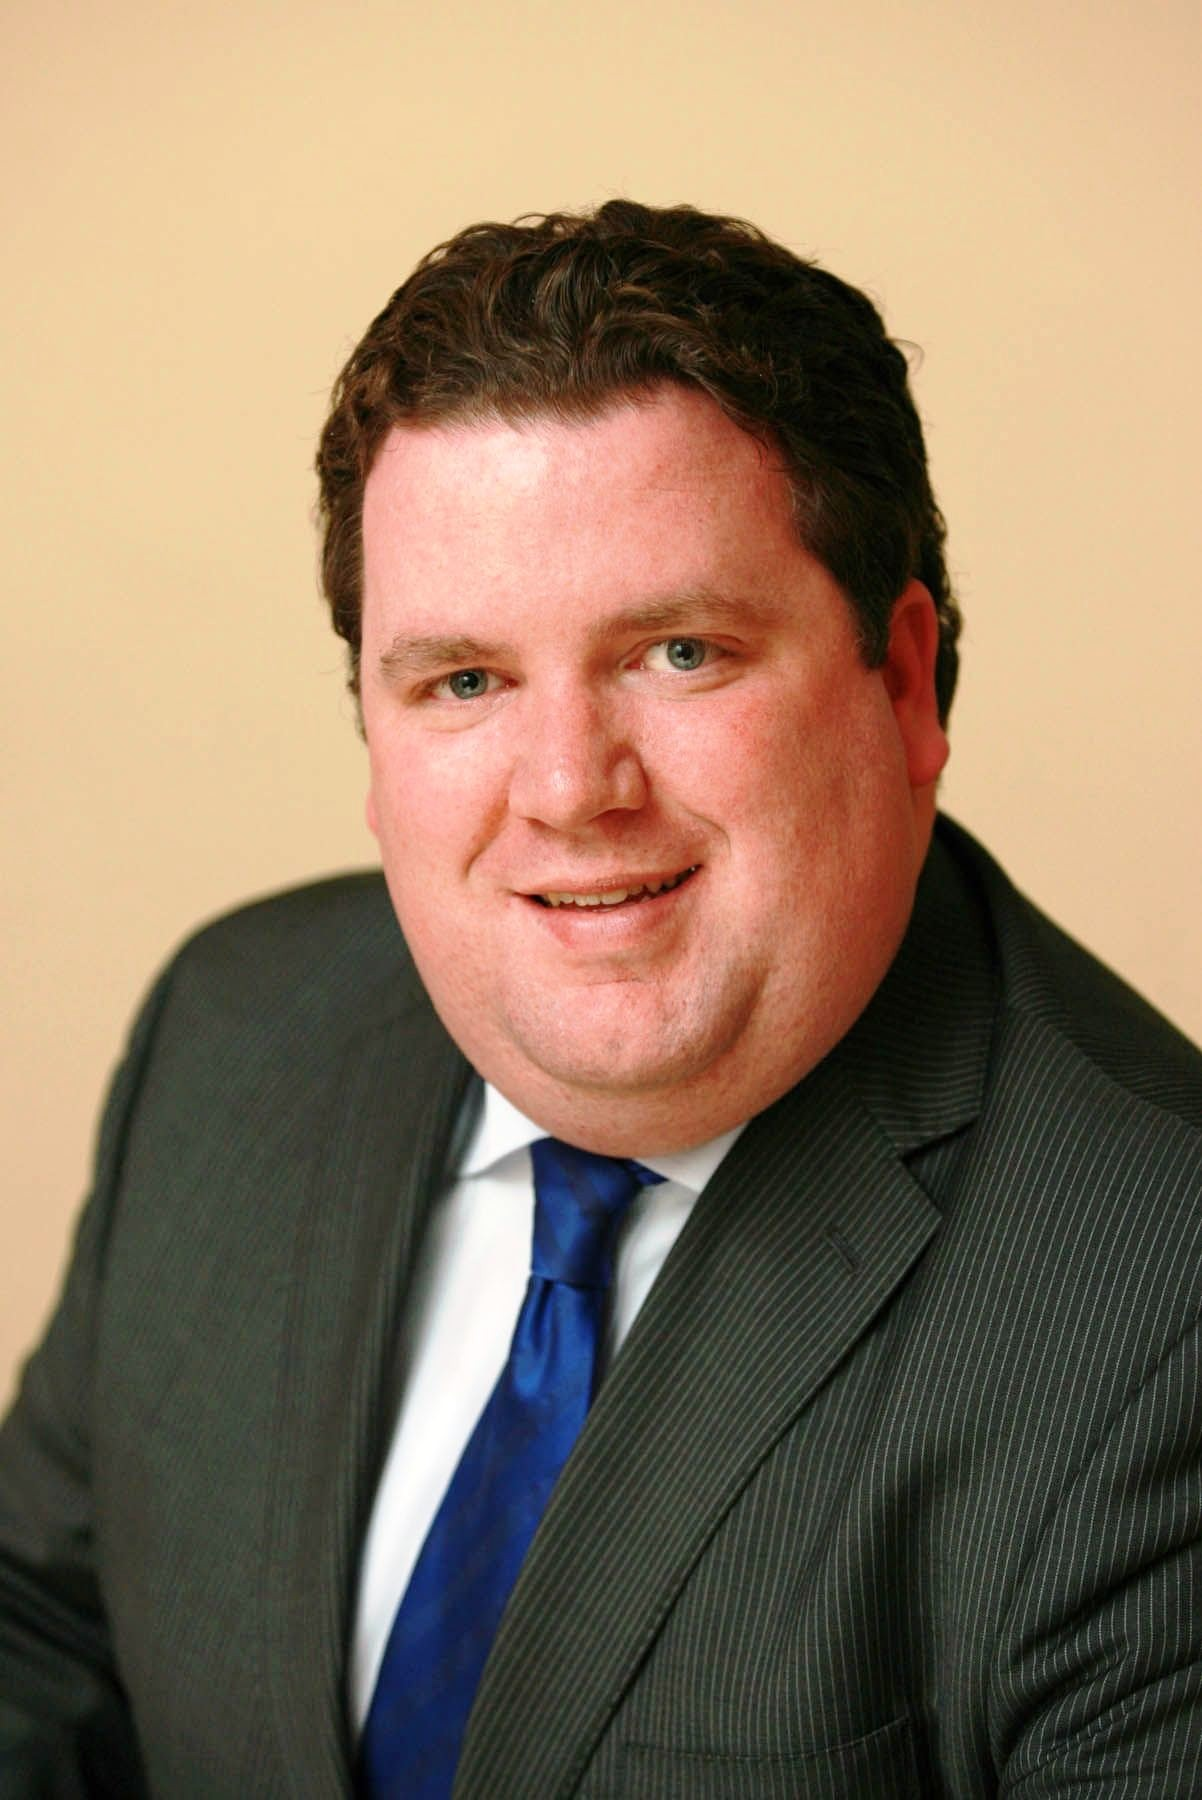 Aidan Sweeney, Dublin, Ireland<br>Accredited: 3rd April 2014